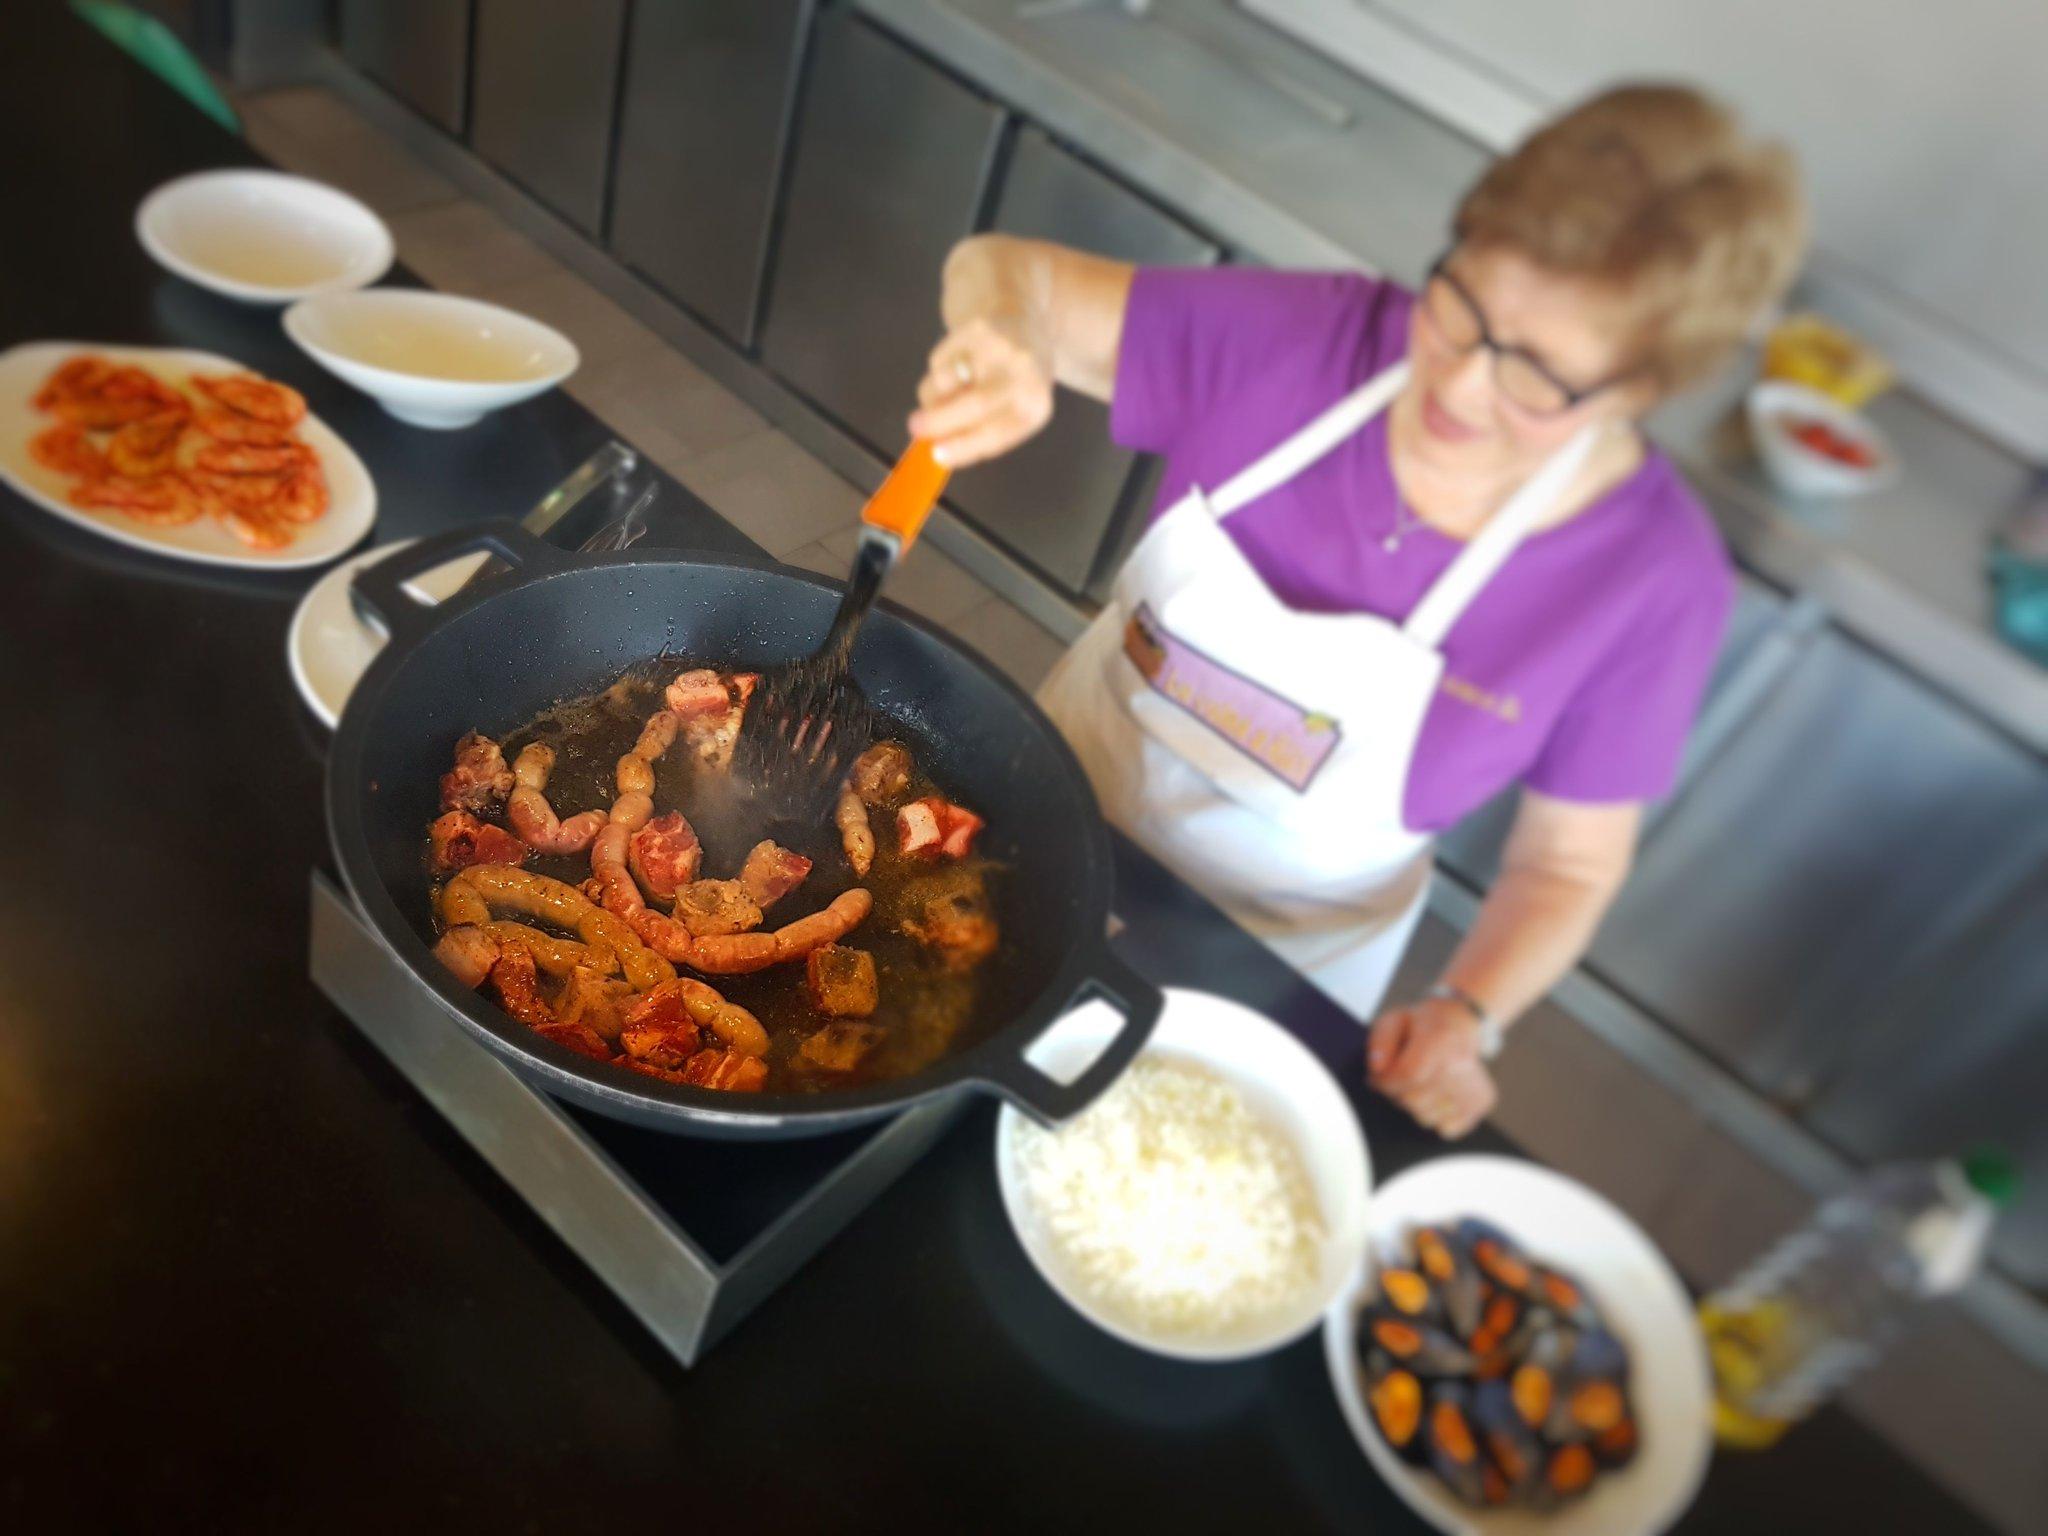 Watching the rice expert of Hostalric work her magic #InCostaBrava @domussentsovi #Cooking #Foodies https://t.co/ufTULpreZg